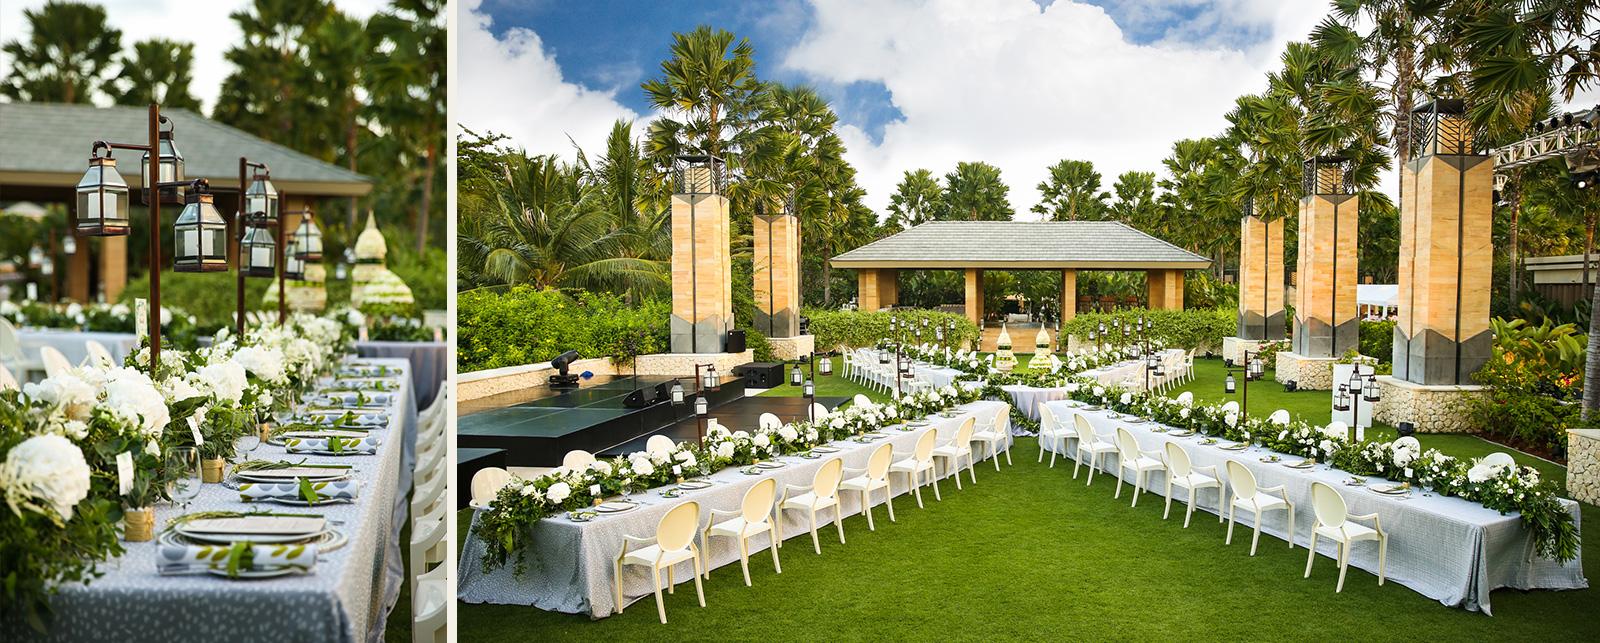 Luxury wedding venues the mulia nusa dua bali slide0 background junglespirit Choice Image